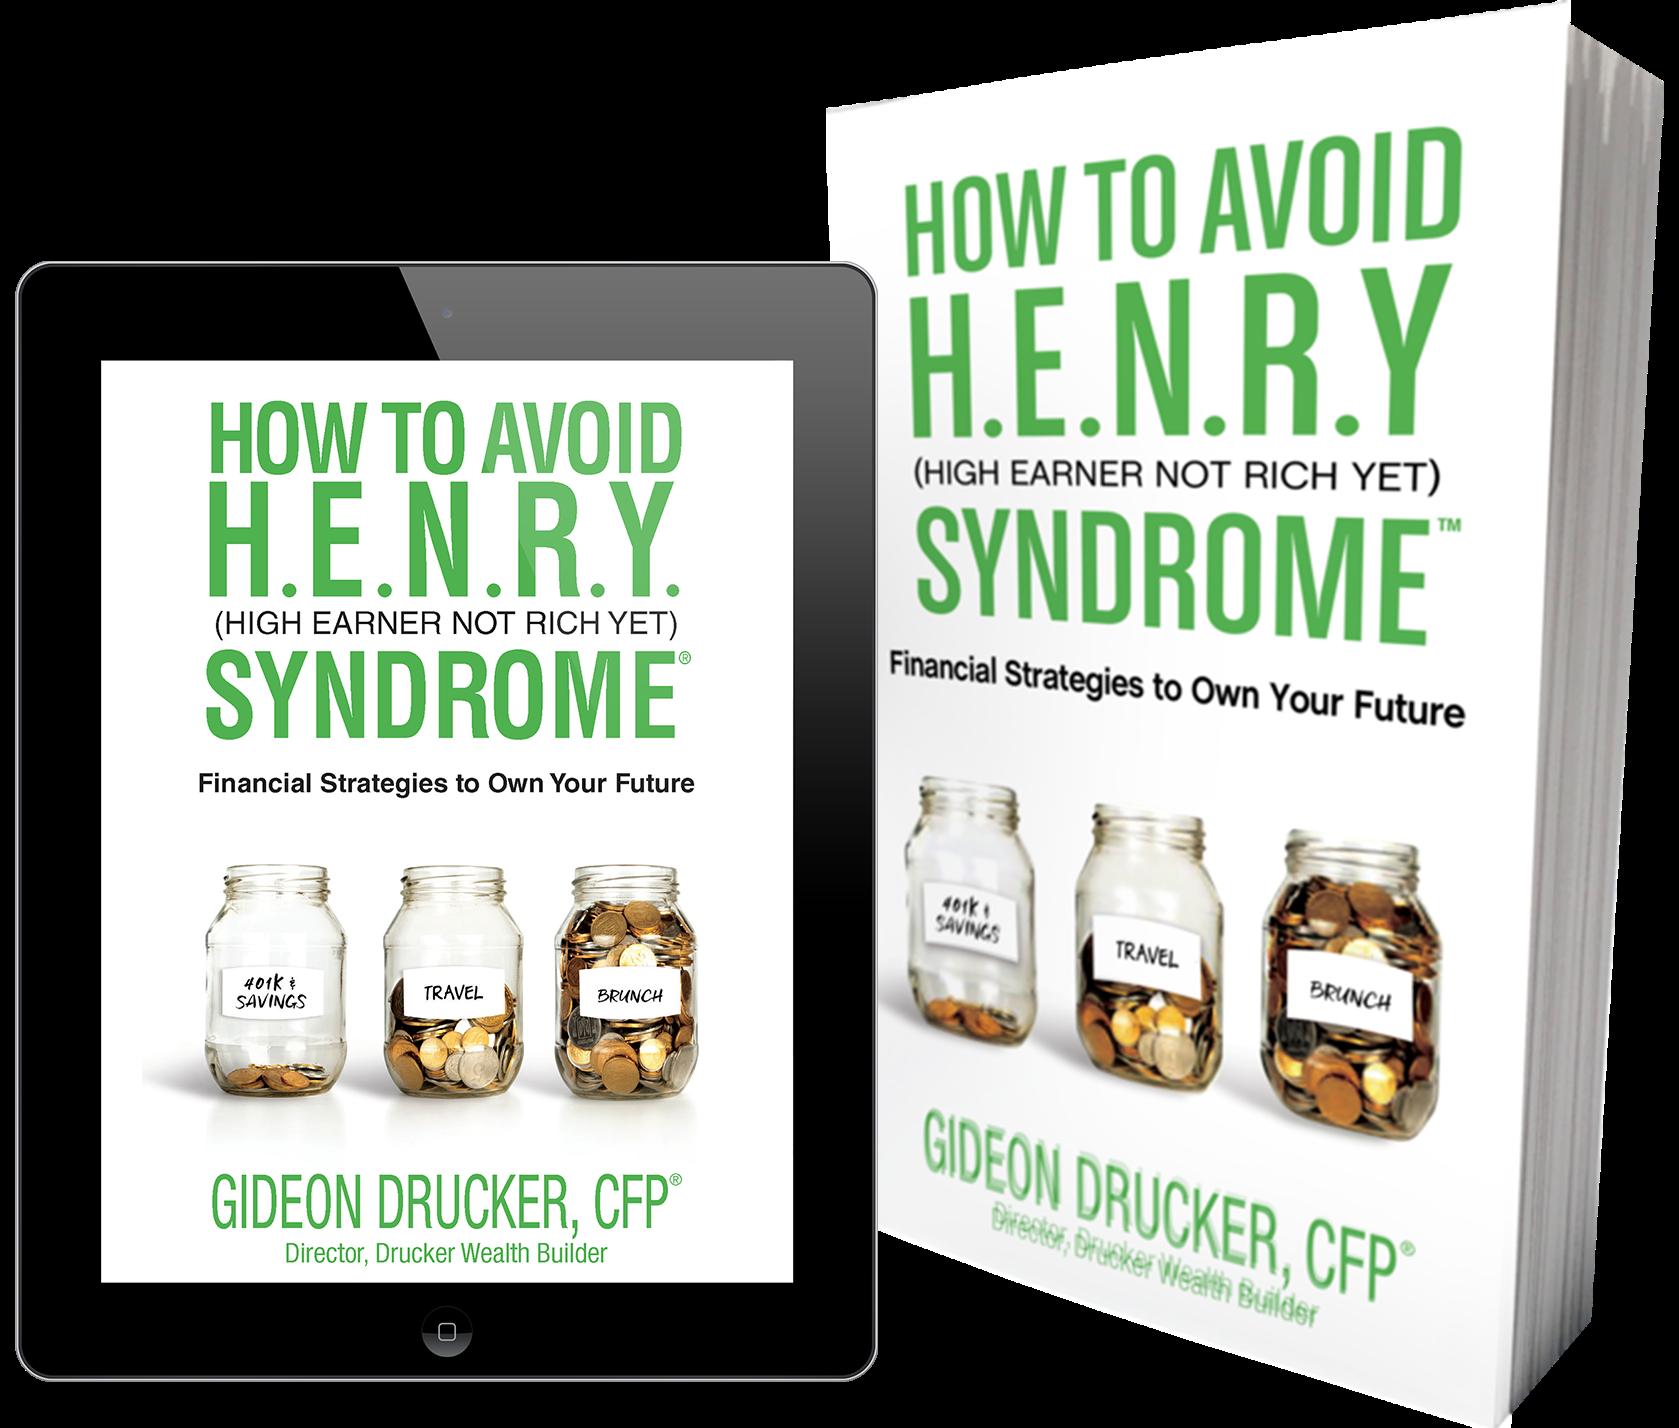 How To Avoid HENRY Syndrome, Author Gideon Drucker CFP